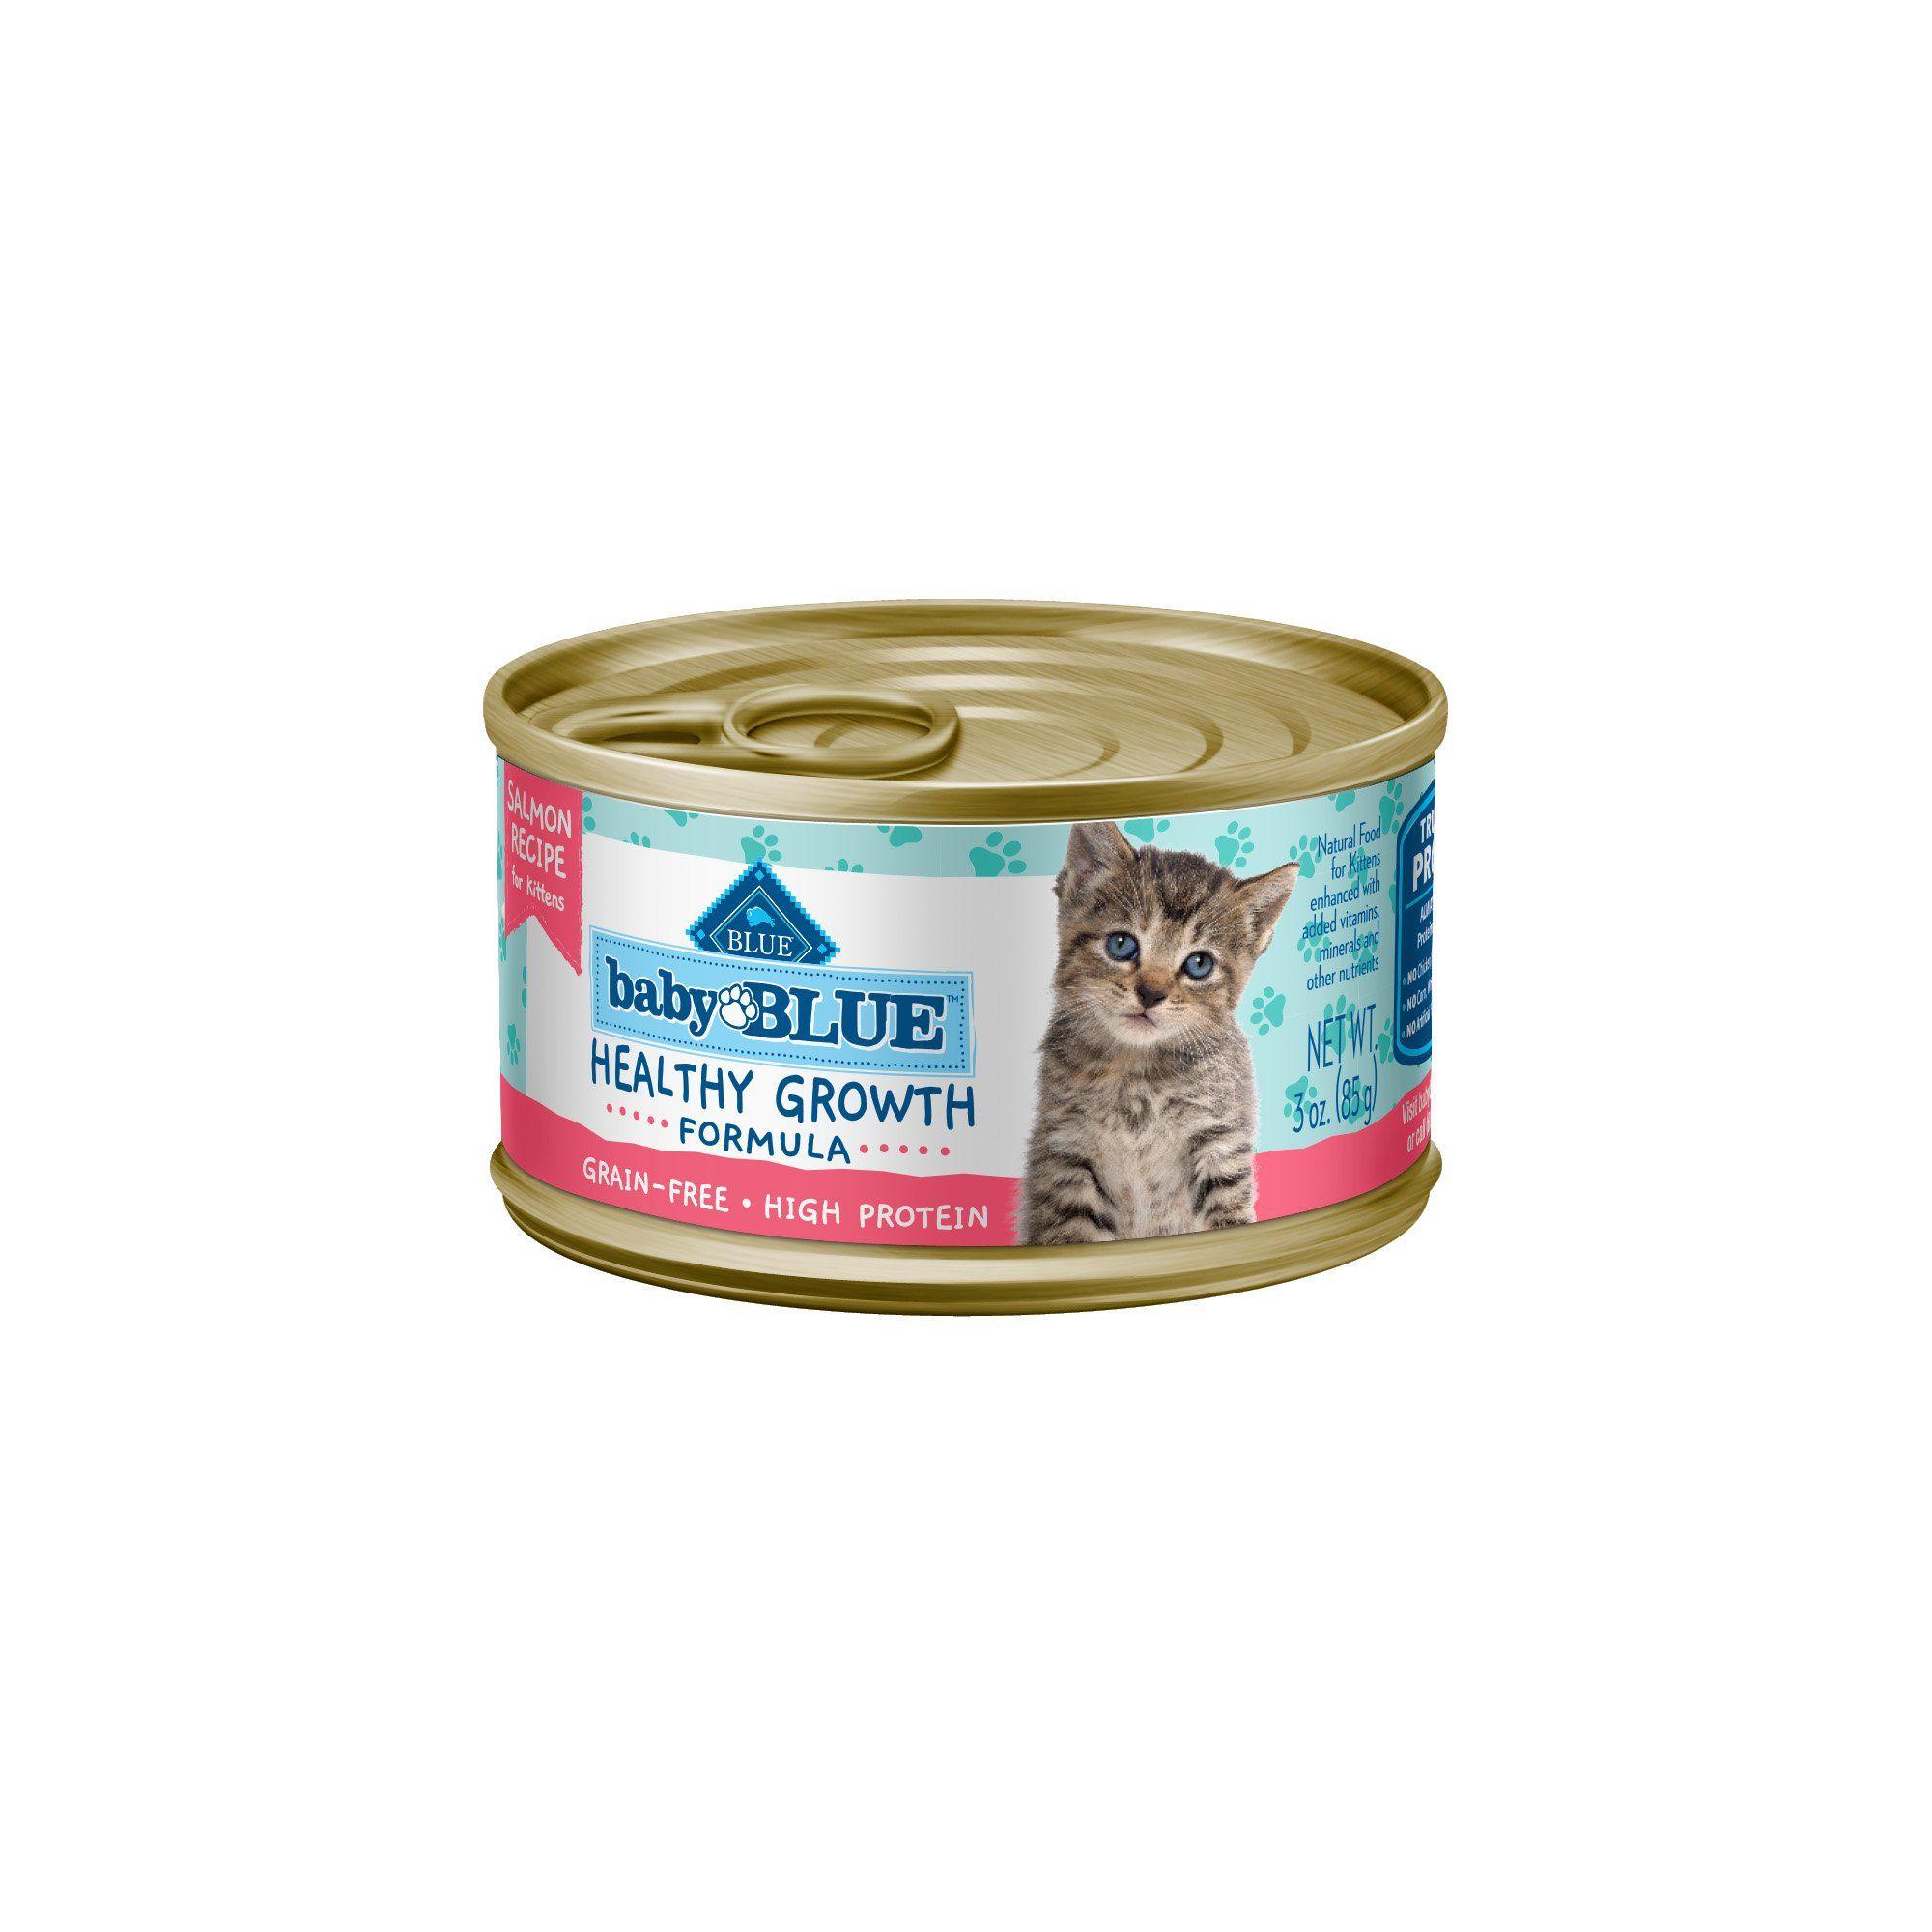 Blue Buffalo Baby Blue Healthy Growth Formula Natural Grain Free Salmon Recipe Kitten Pate Wet Food 3 Oz Case Of 24 Petco In 2020 Blue Buffalo Free Chicken Recipes Grain Free